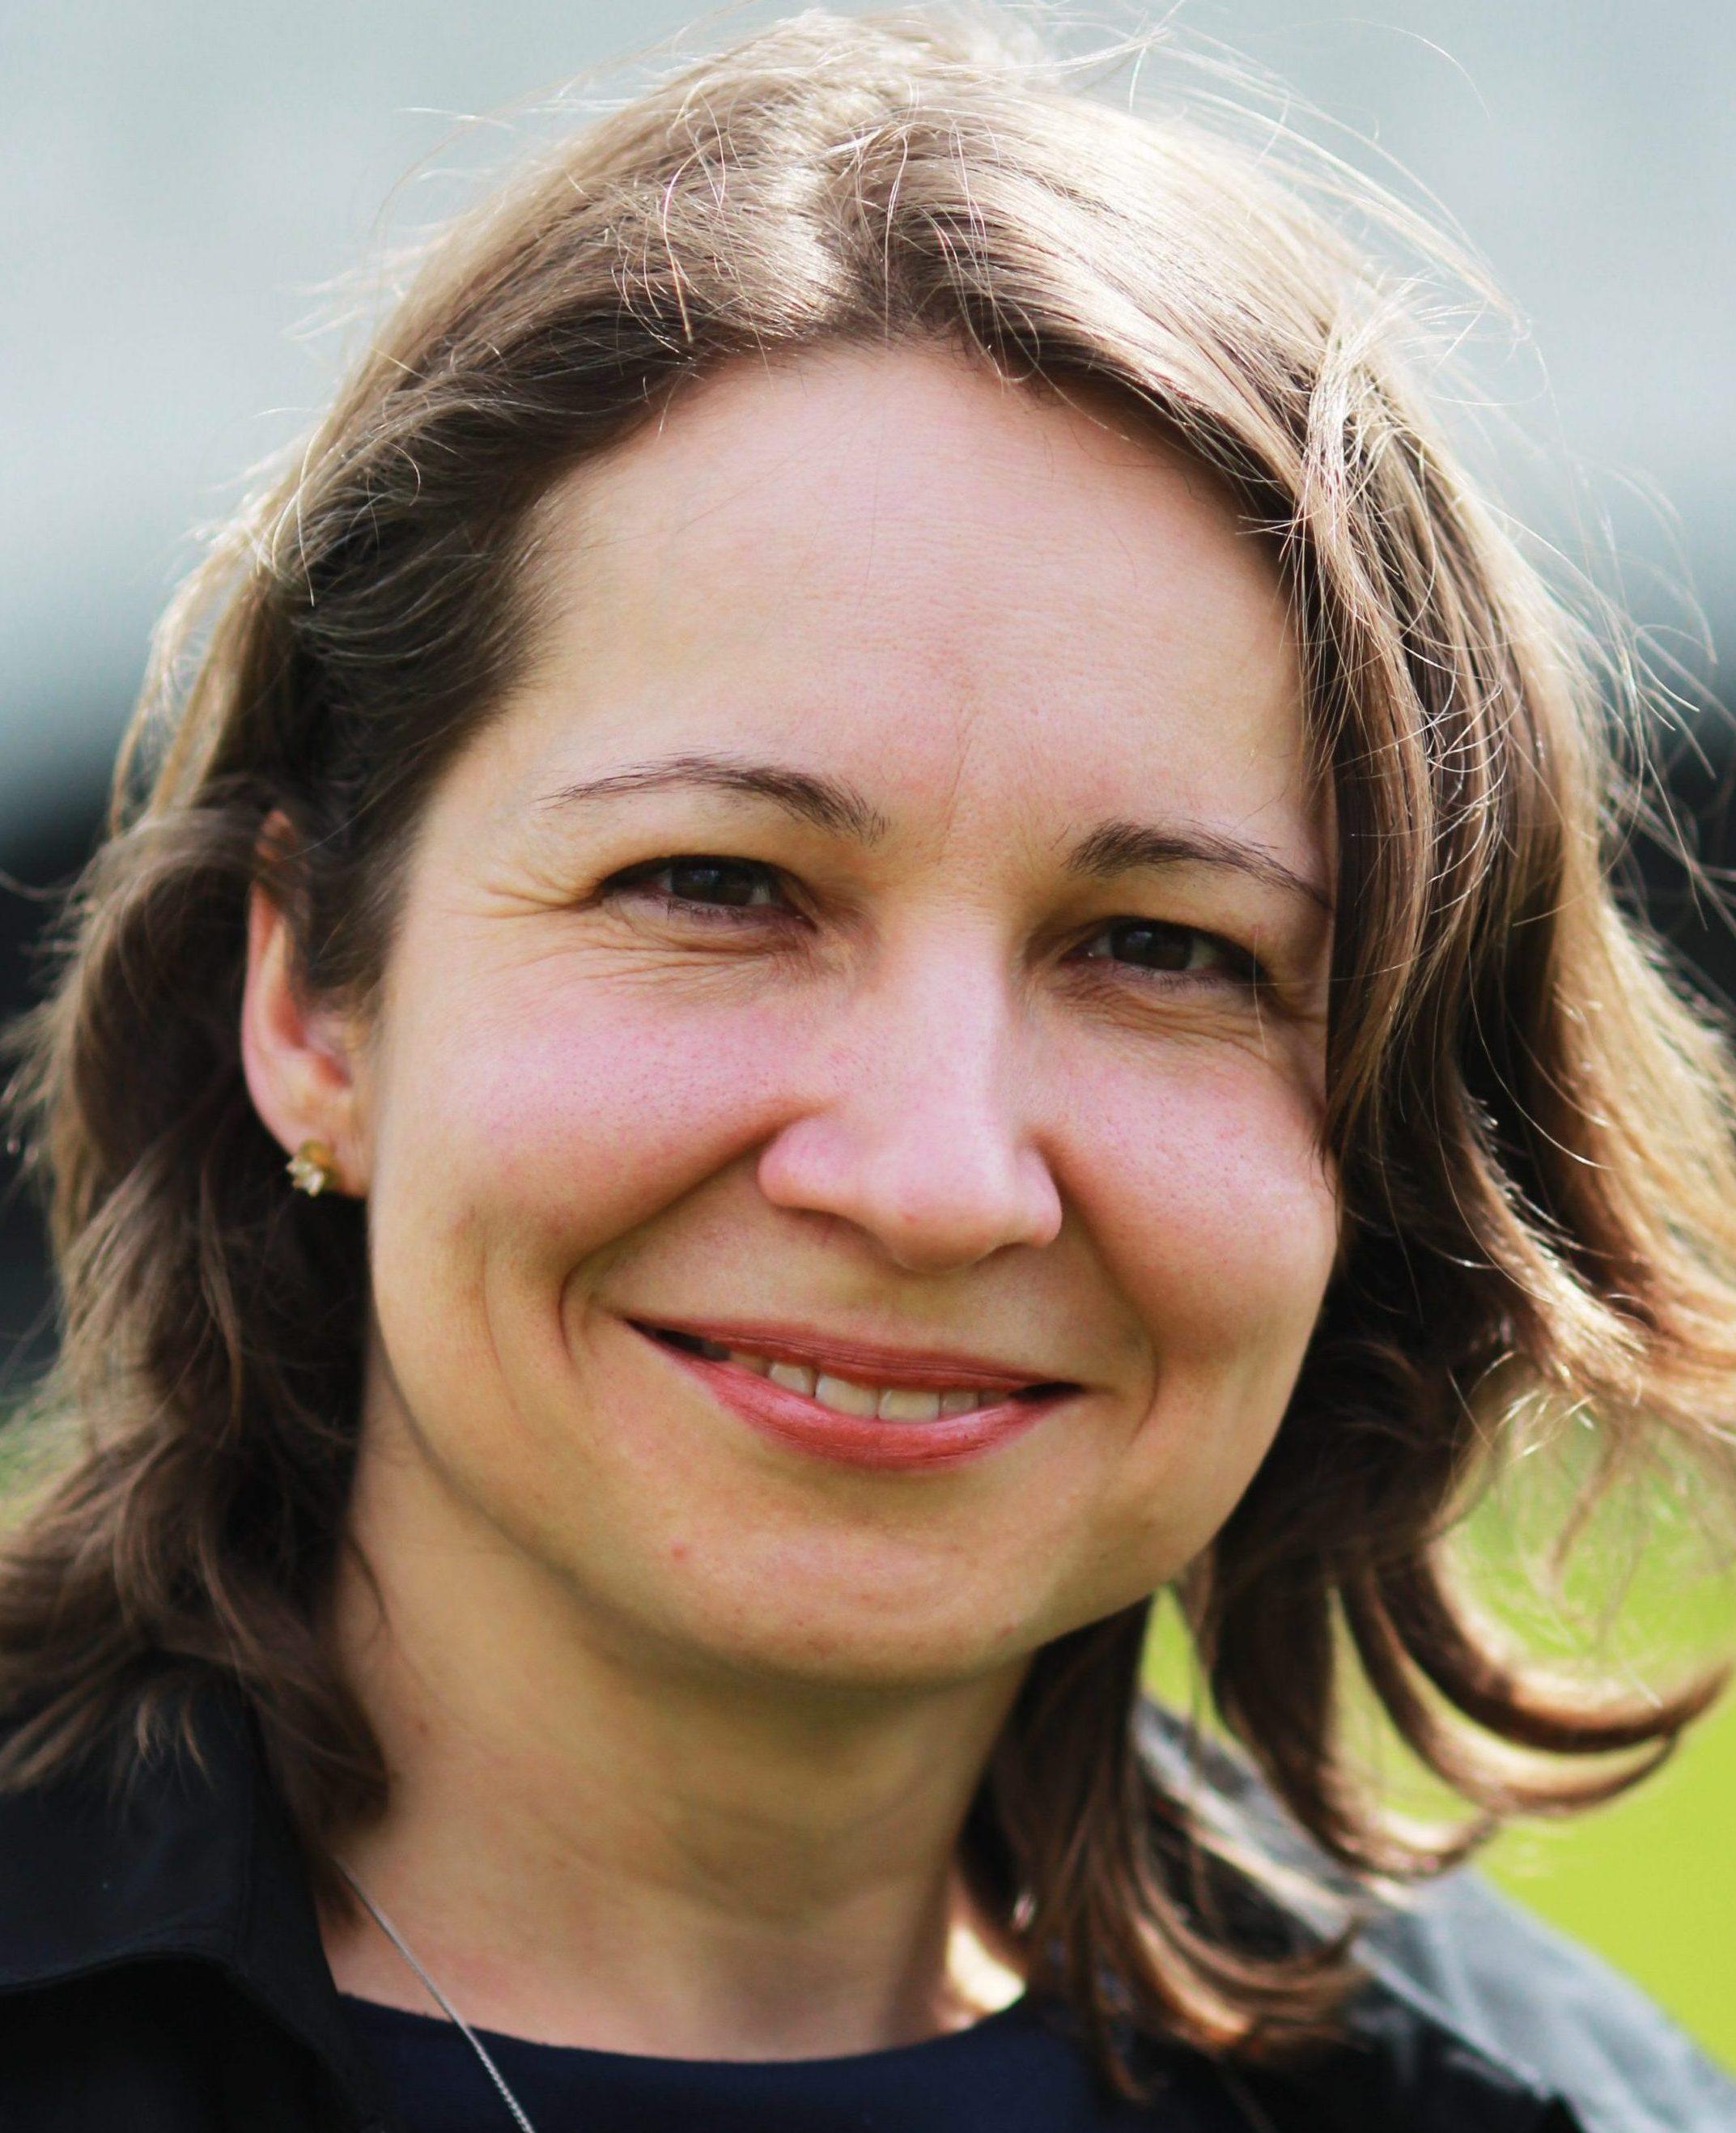 Psychologist Giedrė Širvinskienė